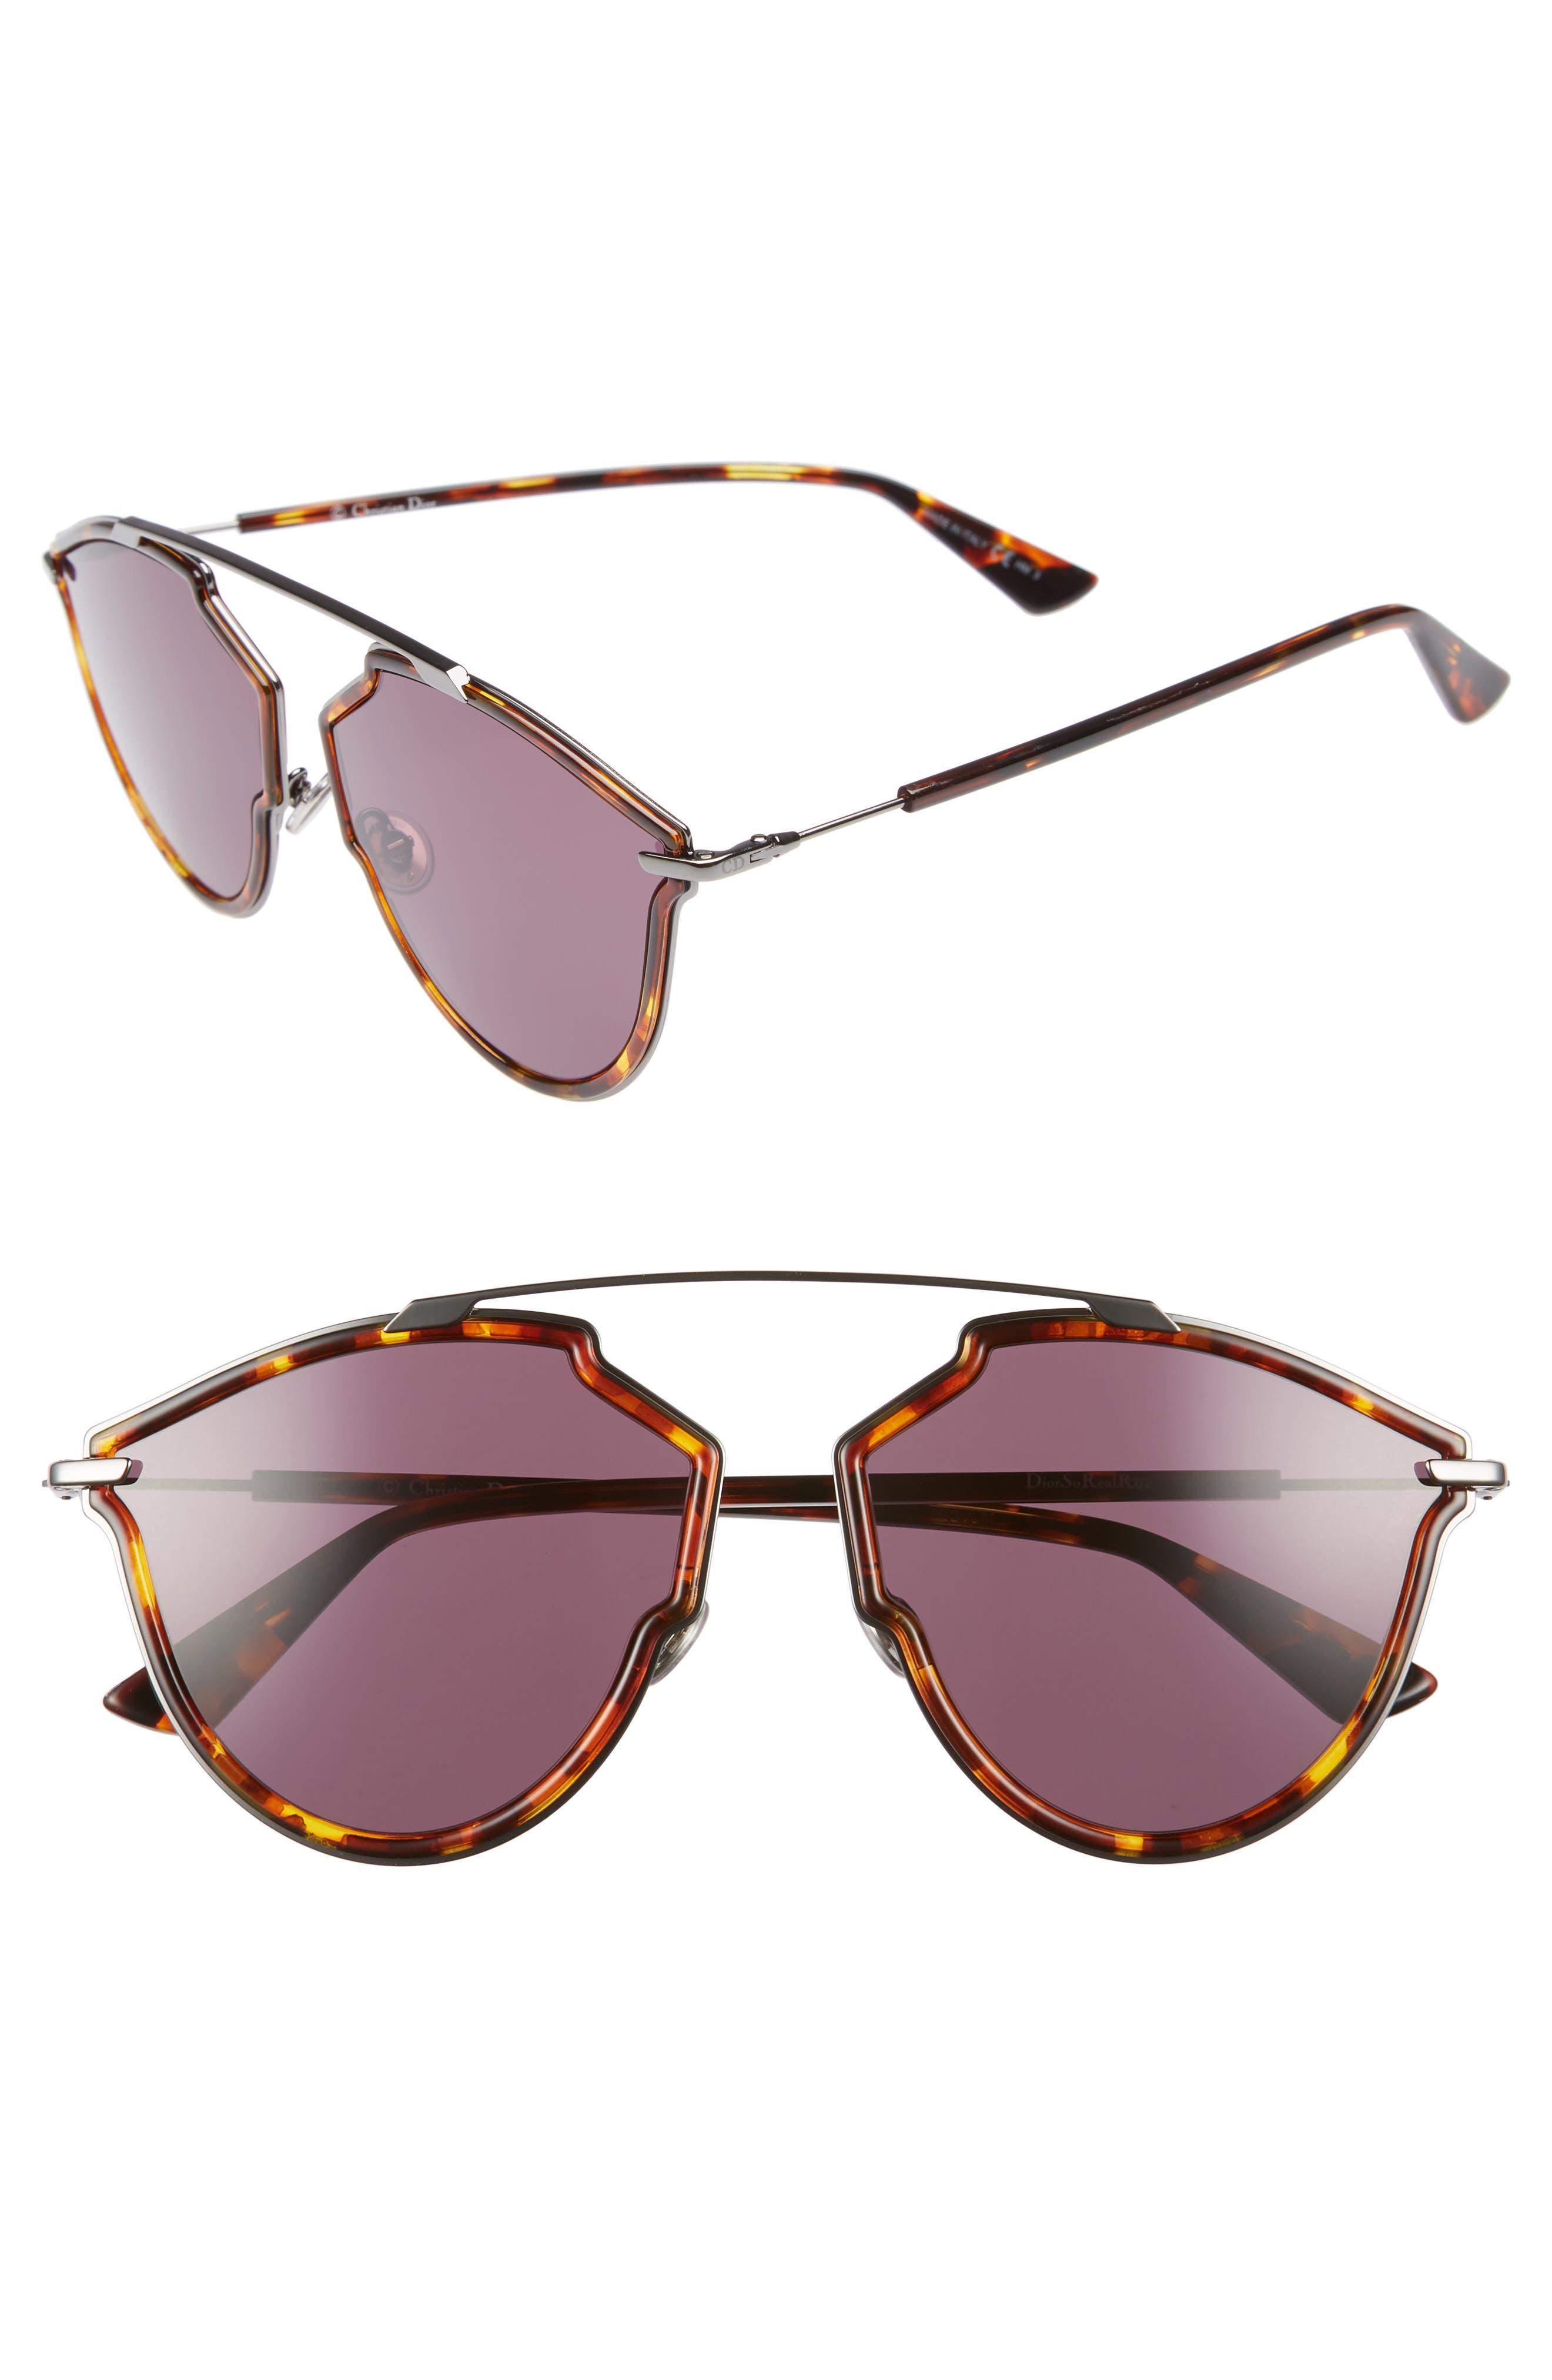 Christian Dior 58mm Round Sunglasses